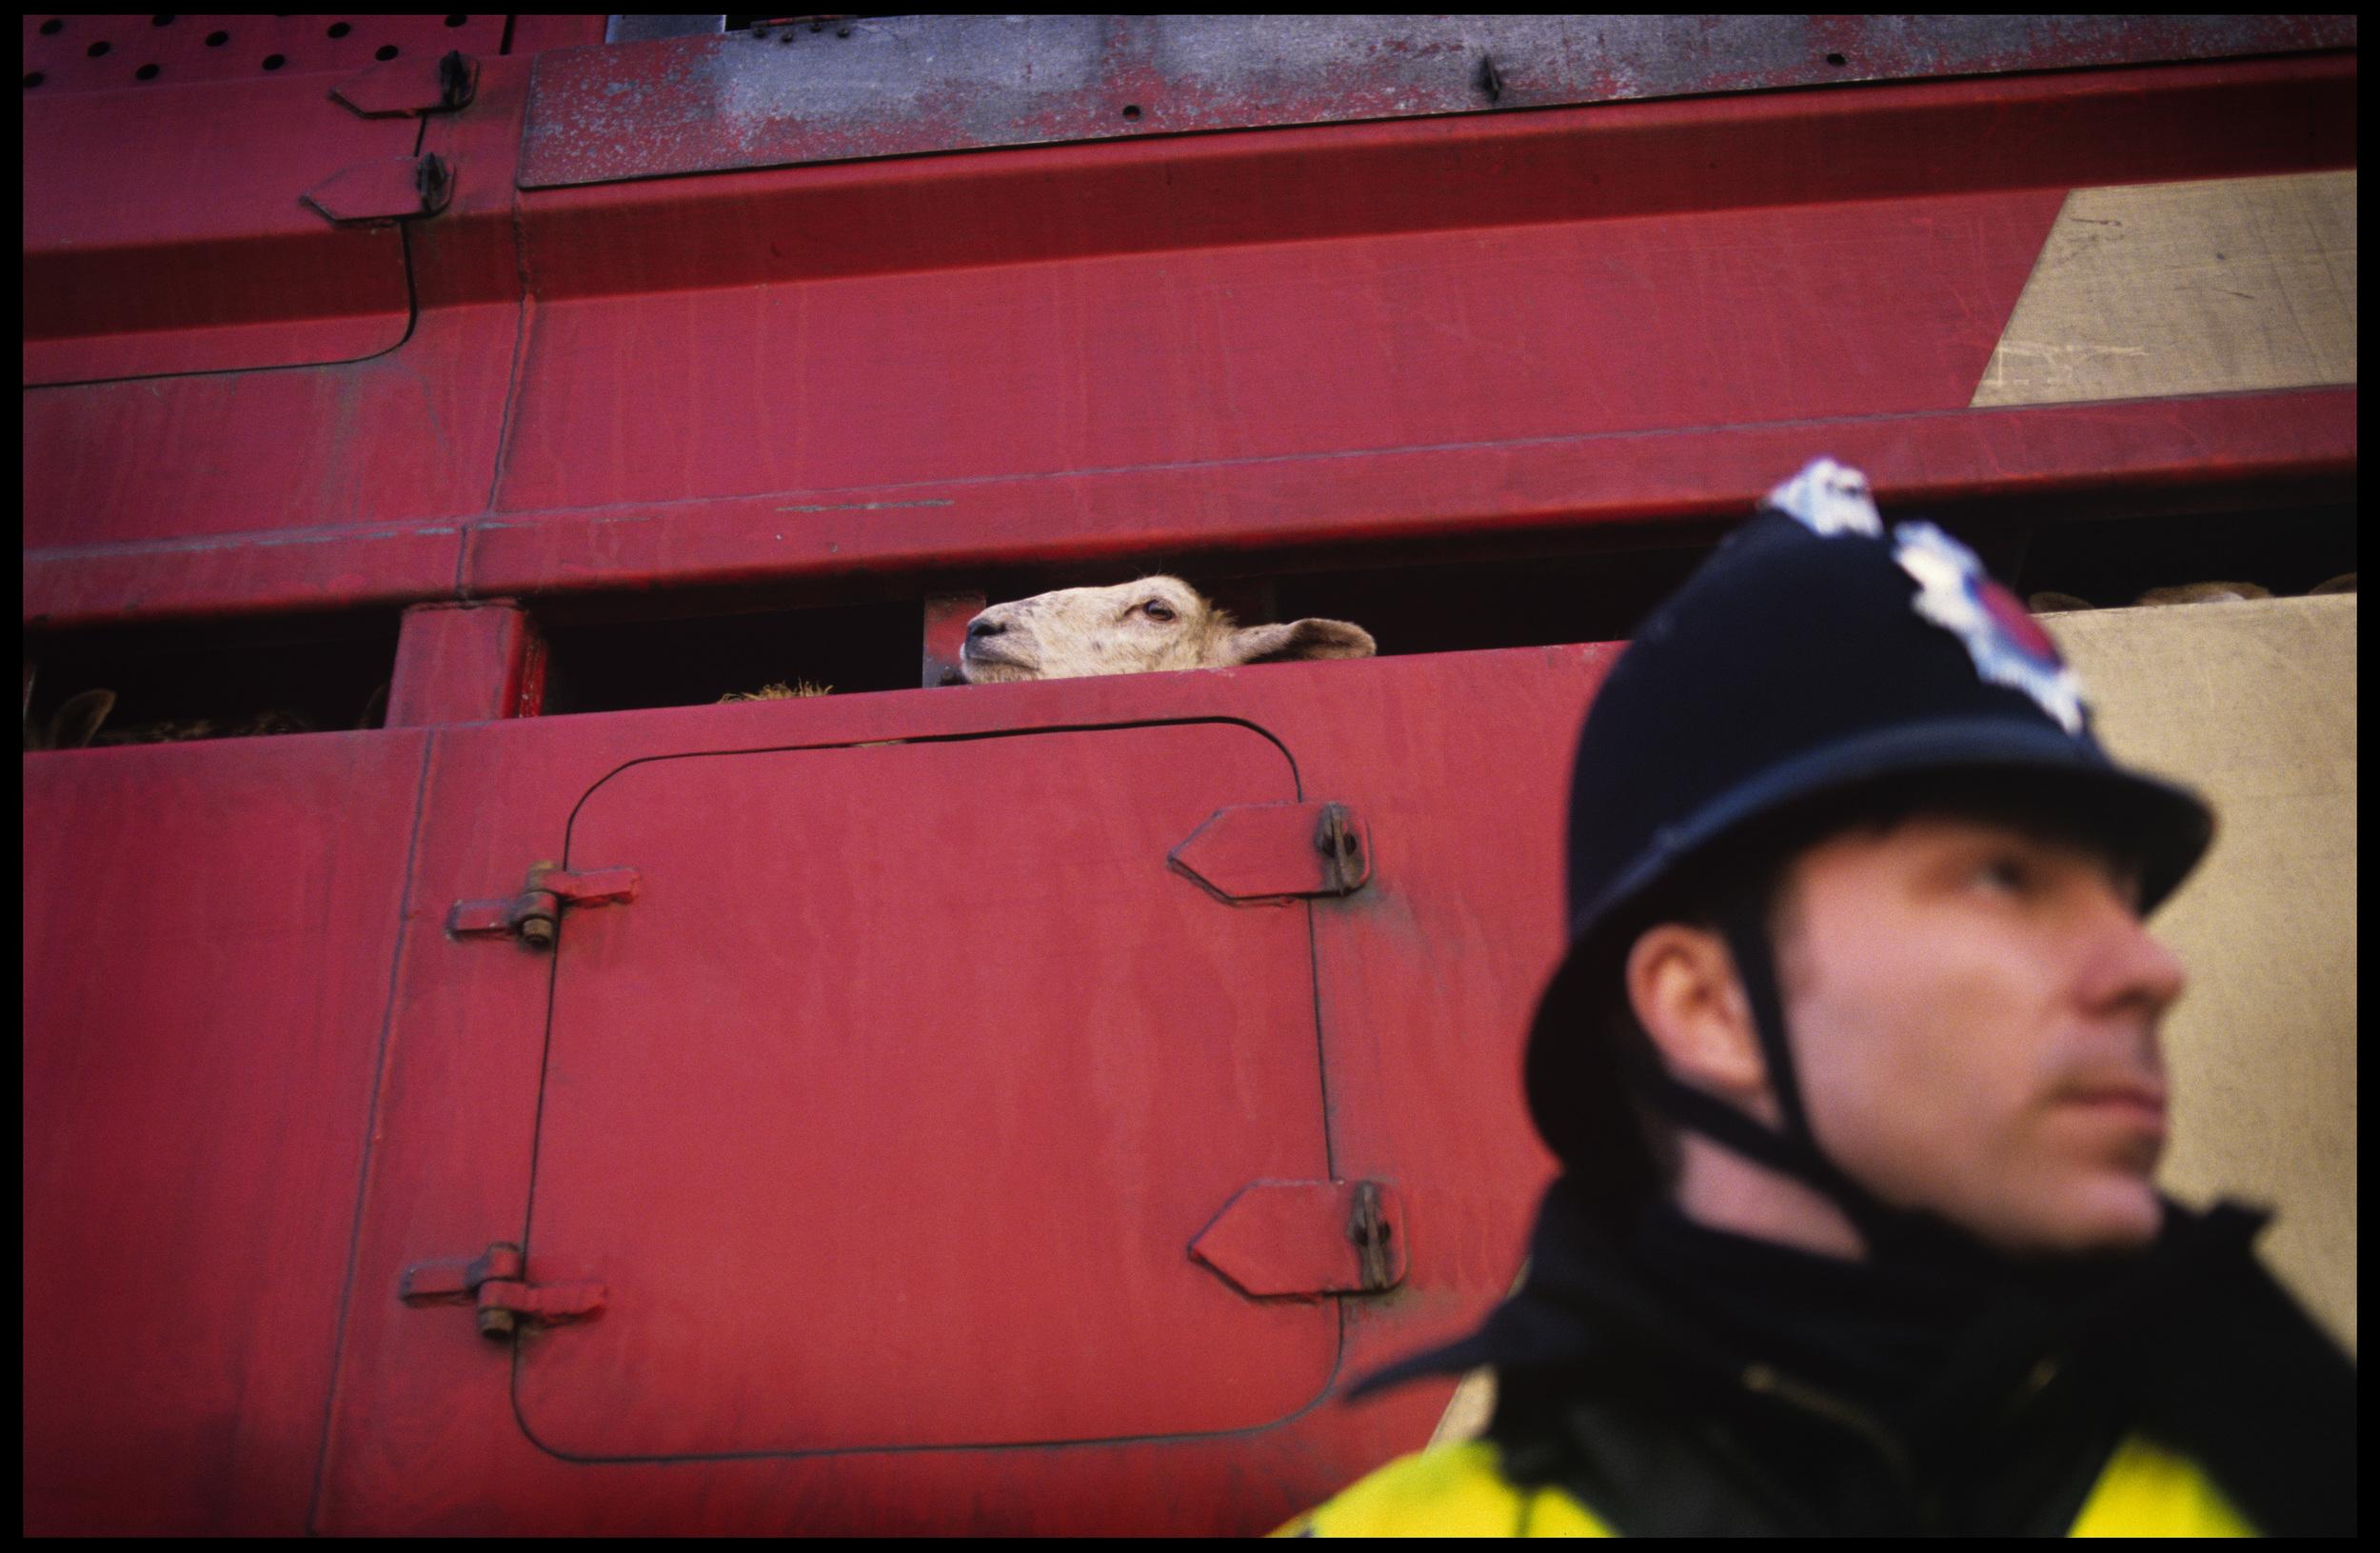 Exportation of livestock to europe demonstrations, Essex